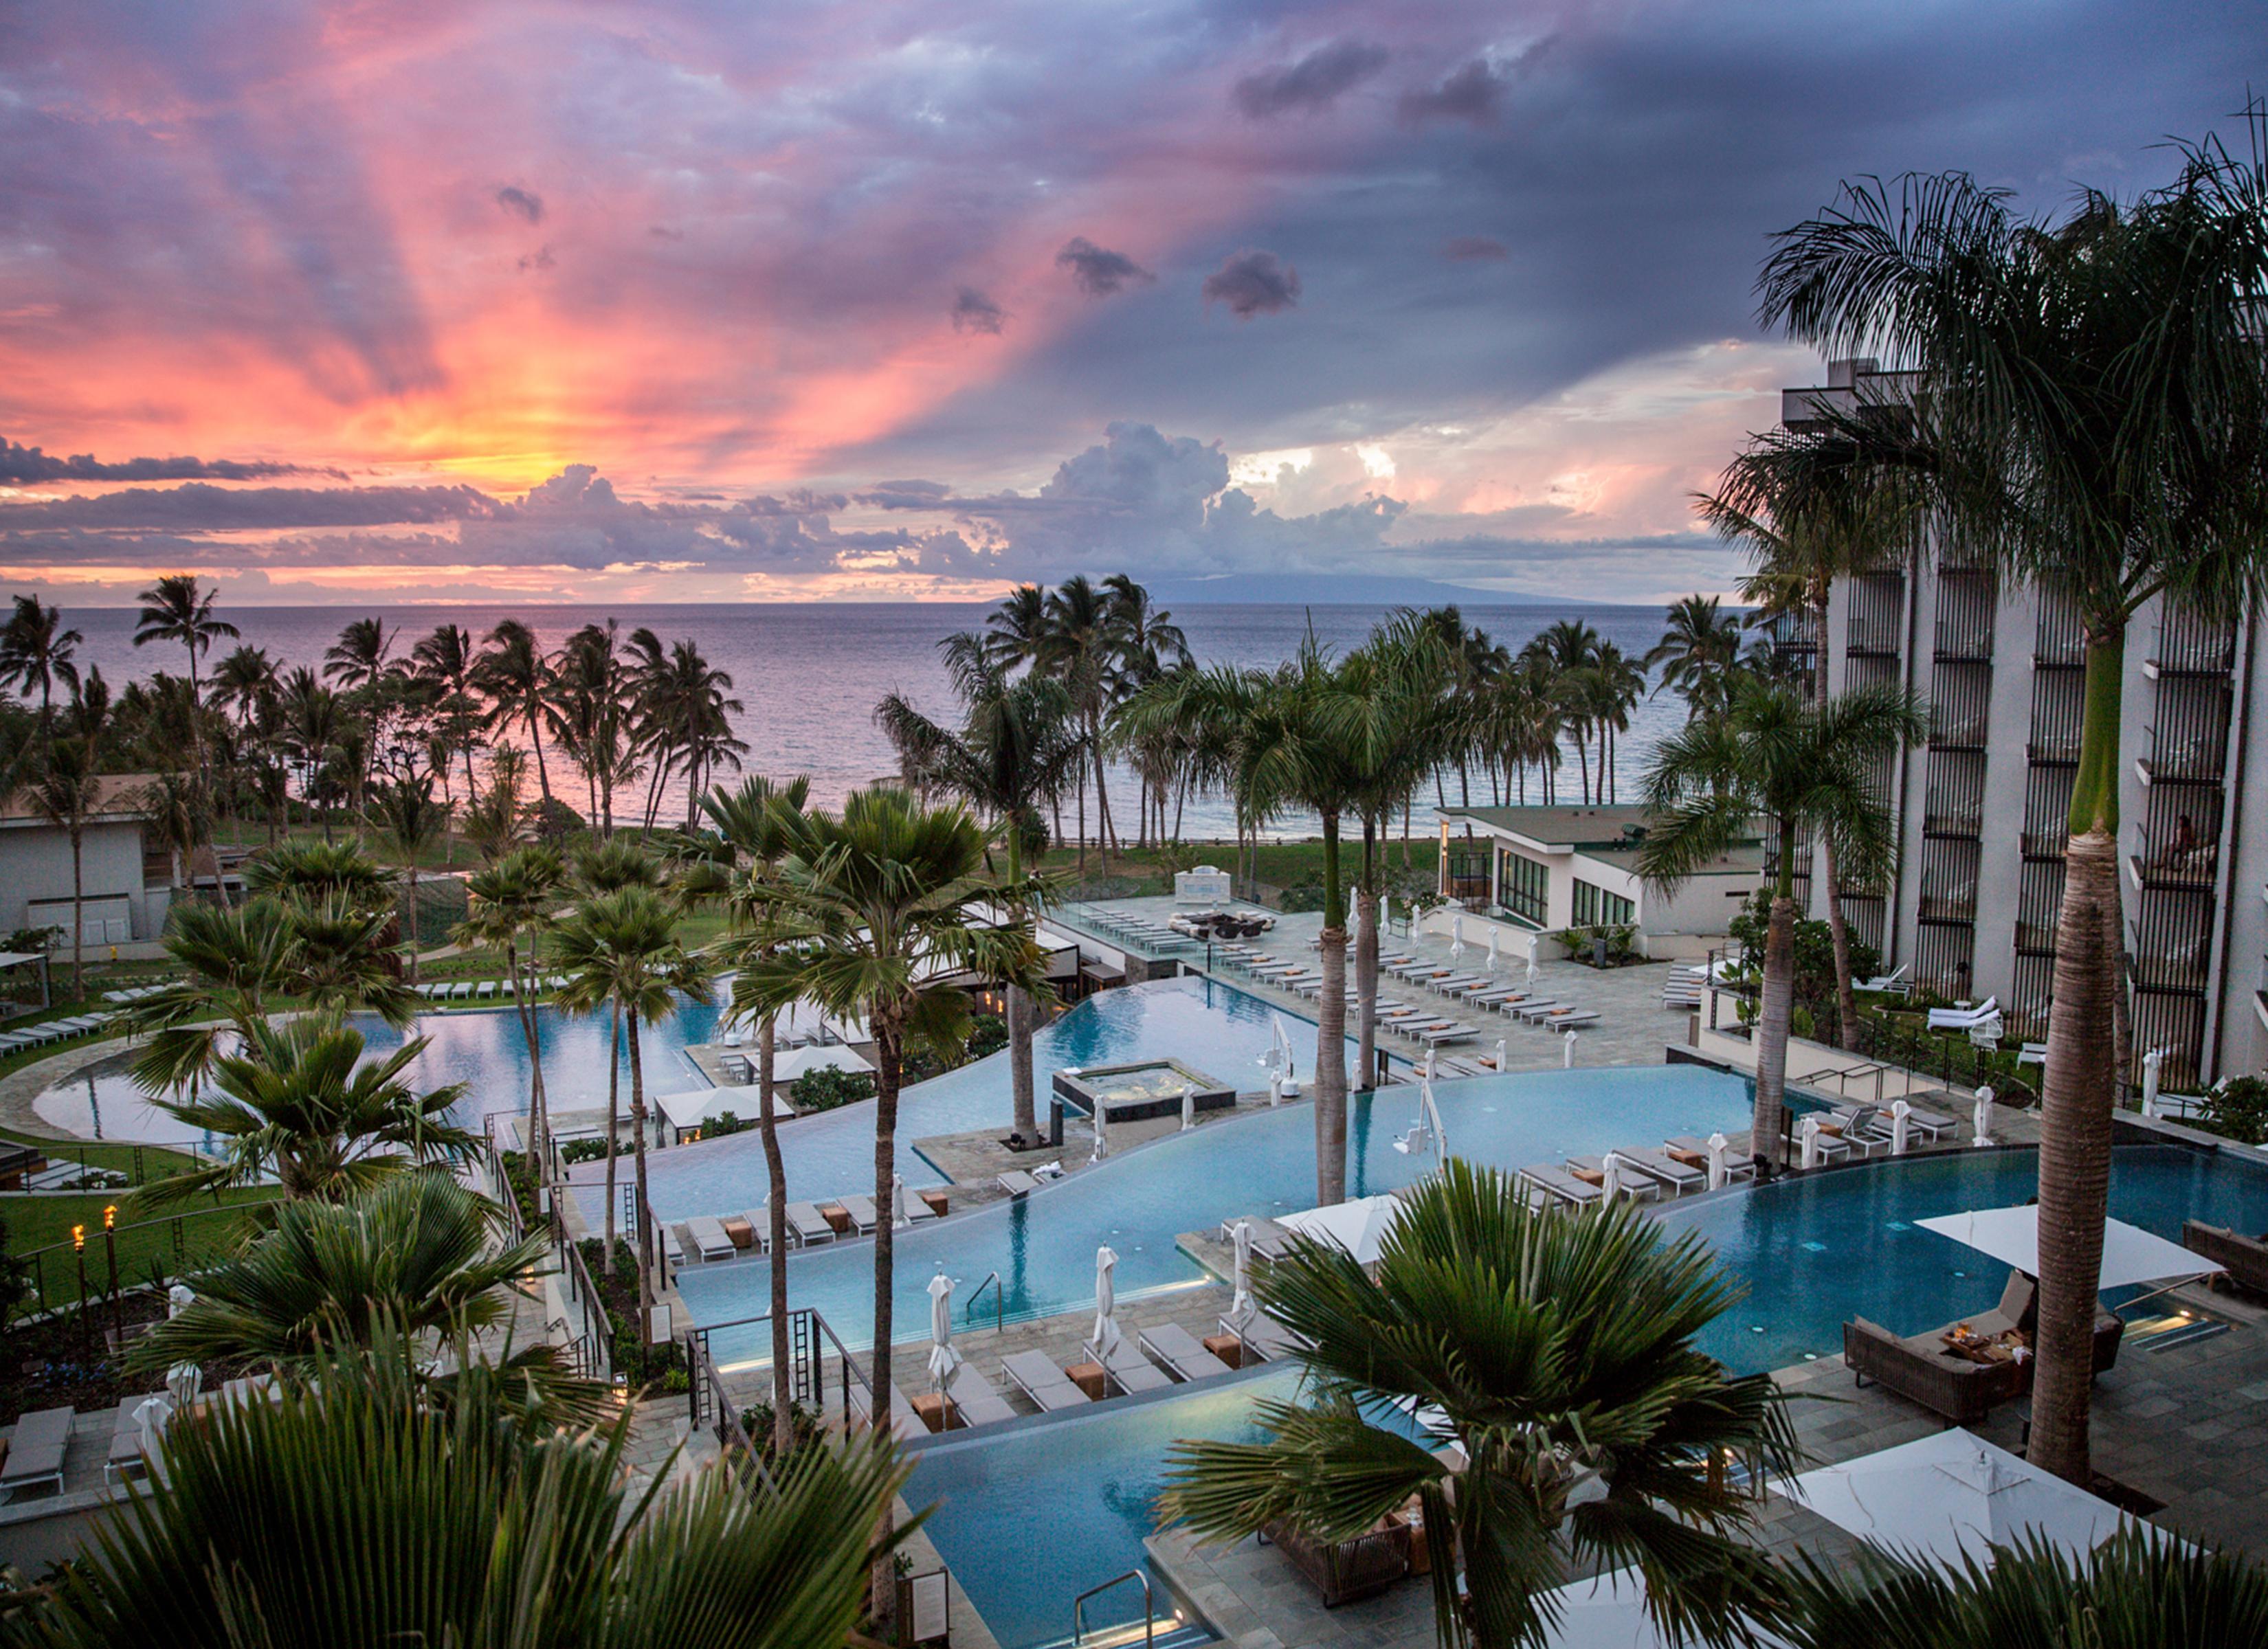 Andaz Maui at Sunset